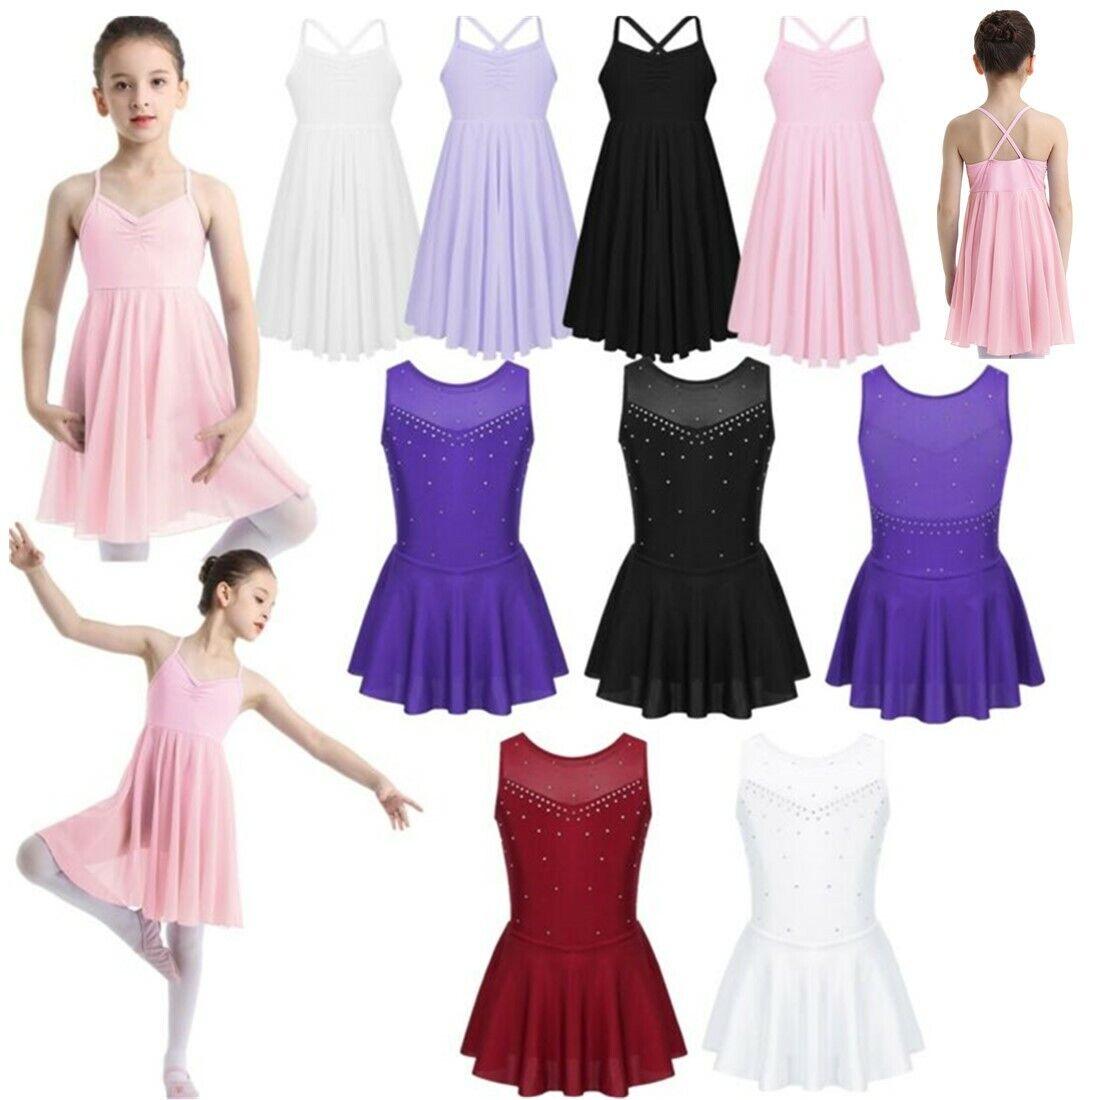 Kids Girl Ballet Dress Dance Leotard Tutu Skirt Chiffon Gymnastics Dancewear